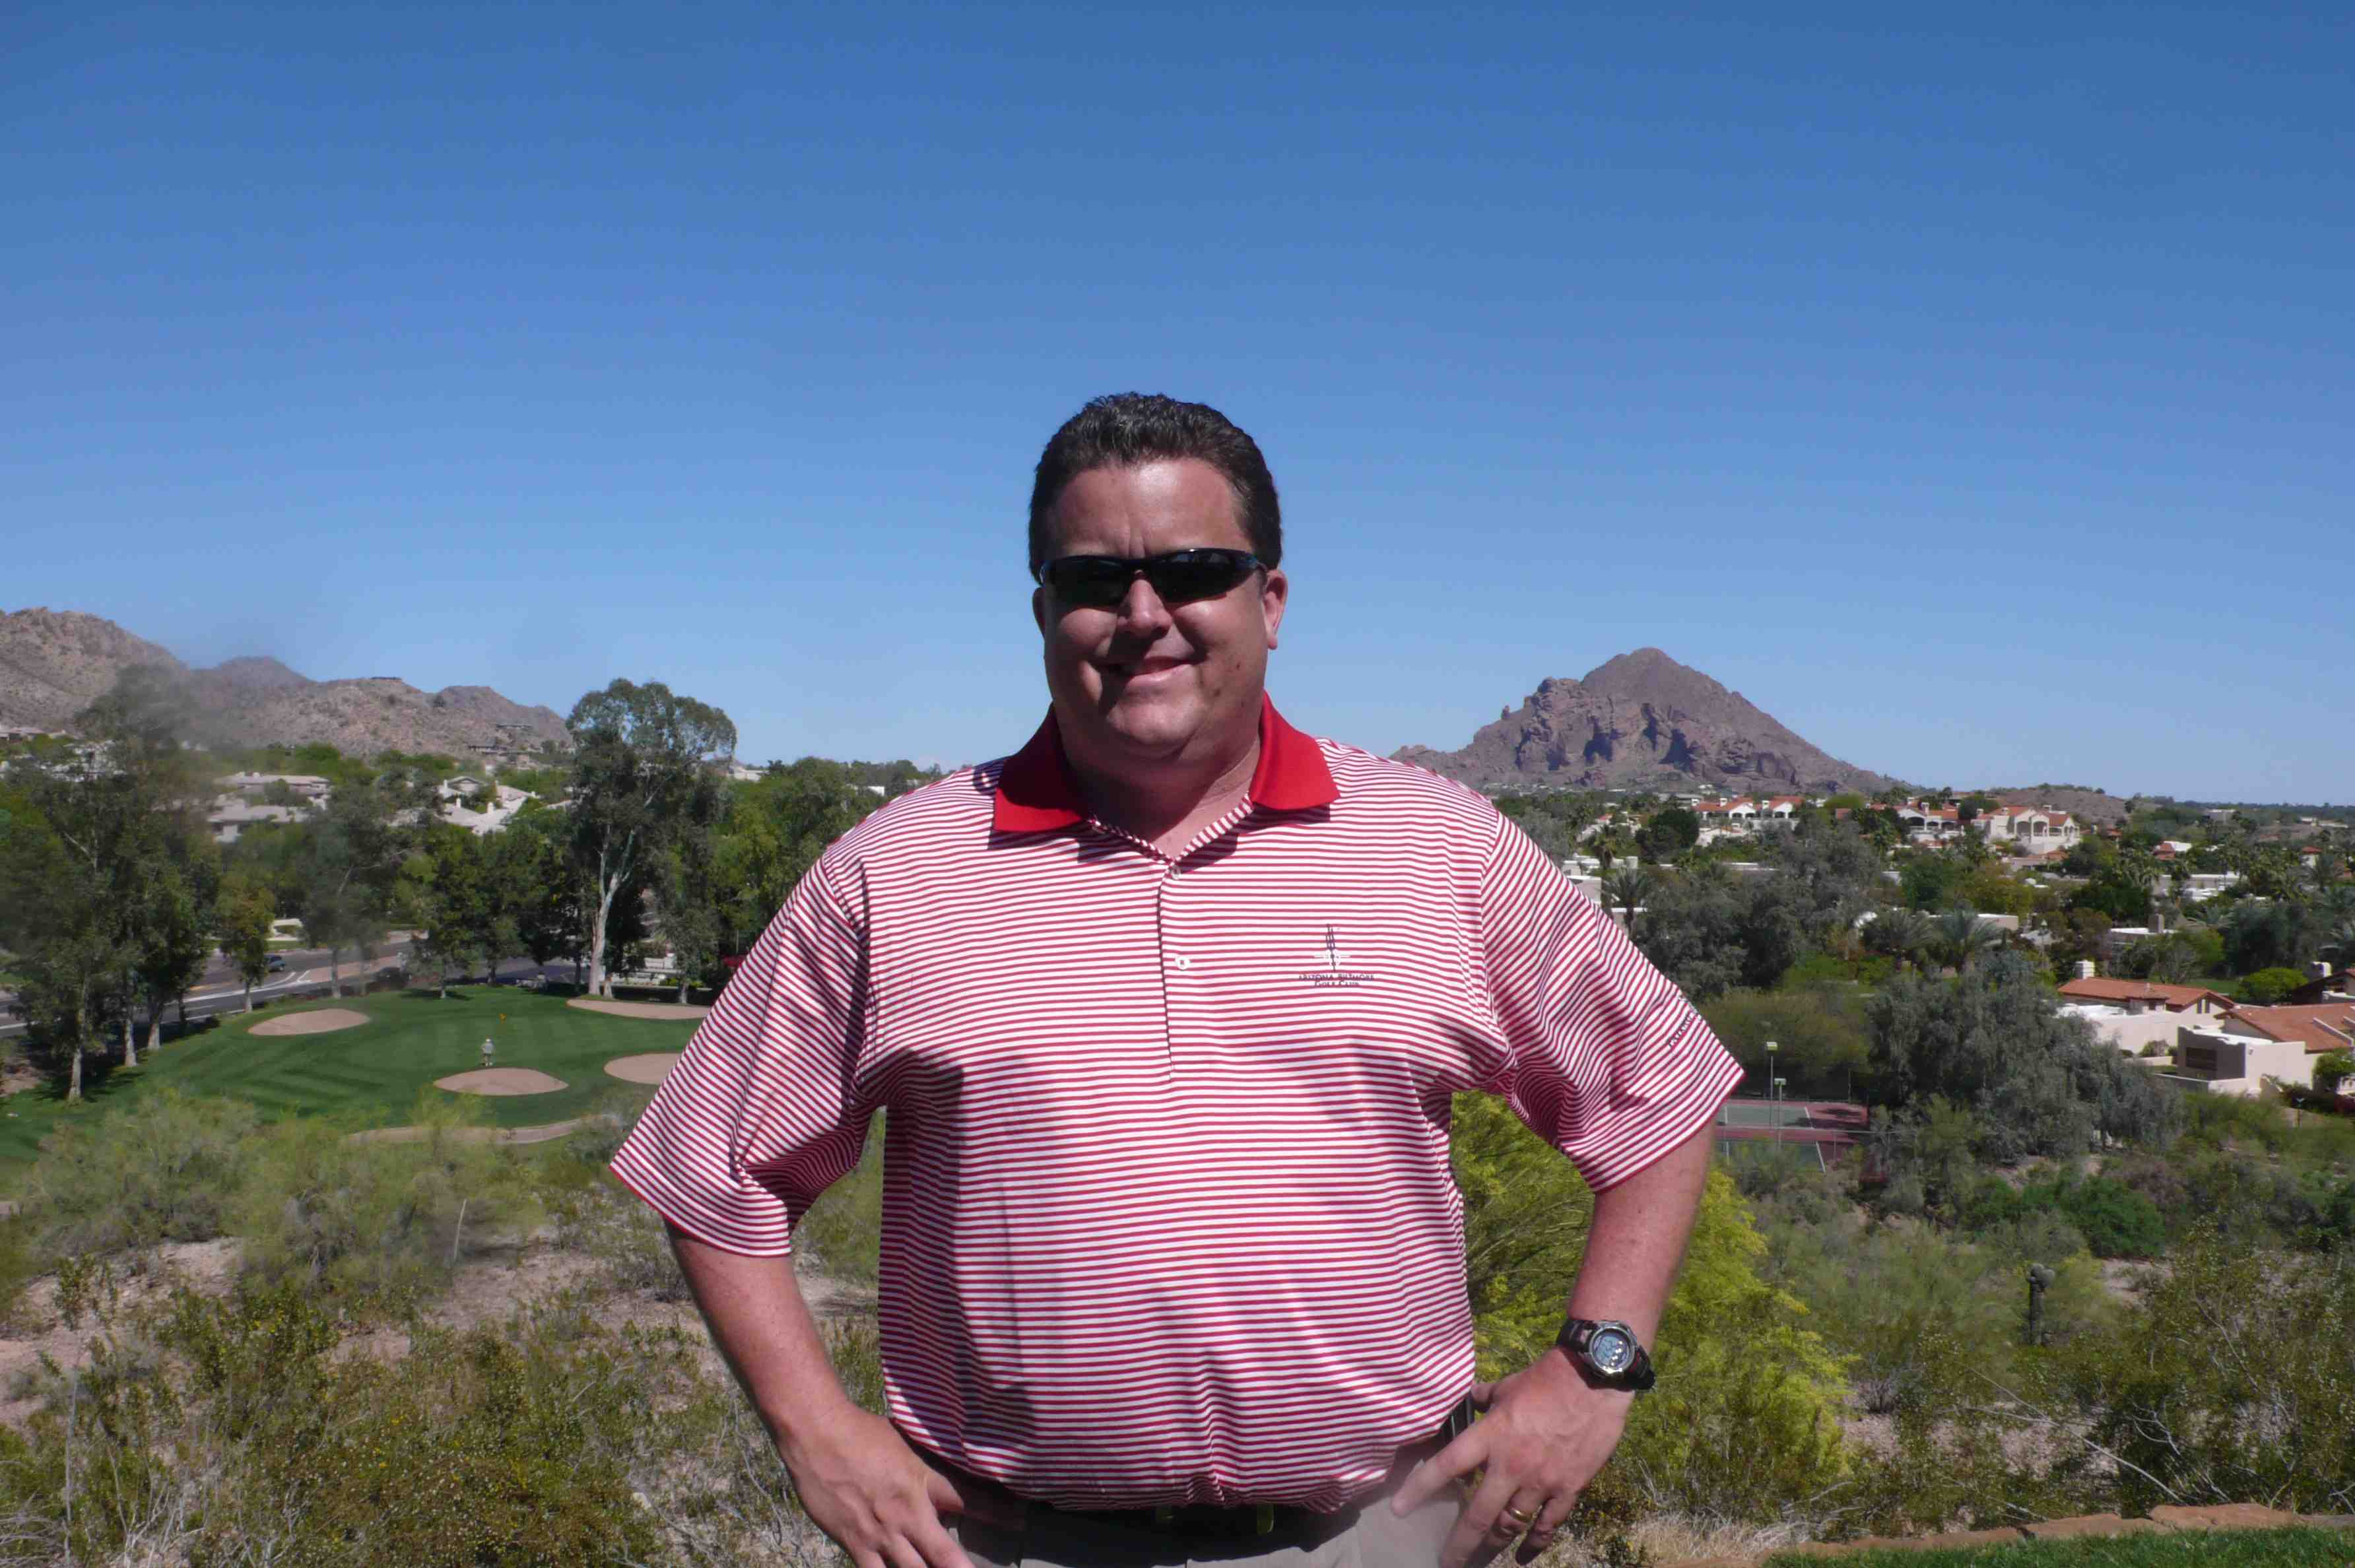 Ron Heraty, Head Golf Pro at the Arizona Biltmore